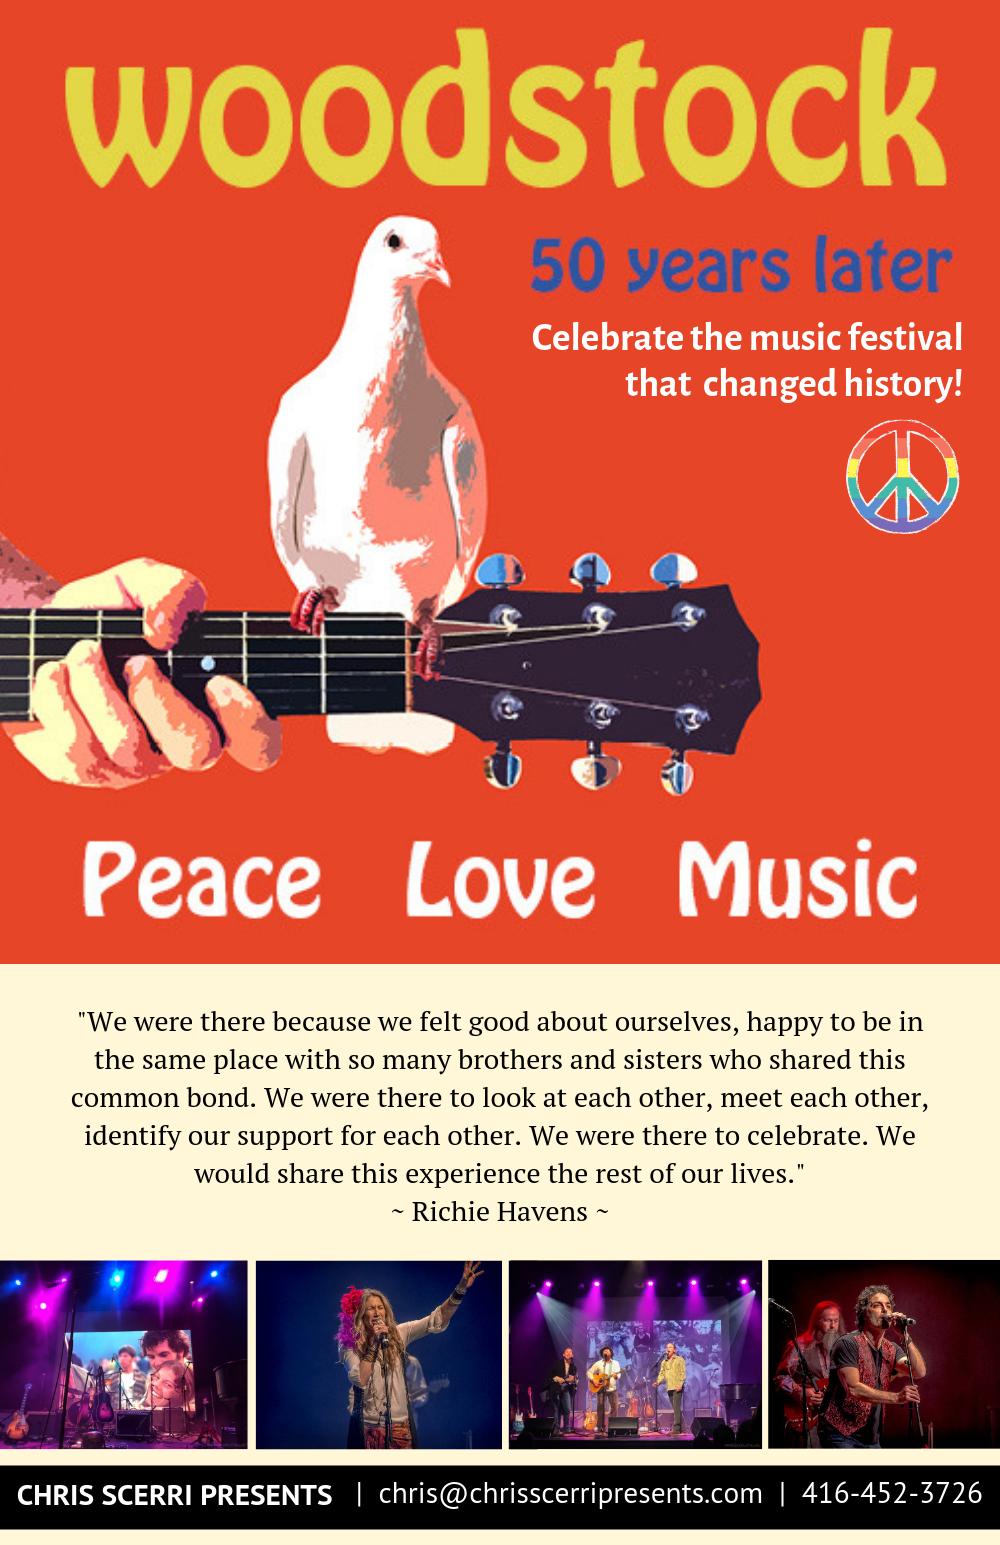 Chris Scerri Presents_Woodstock_touring poster.png